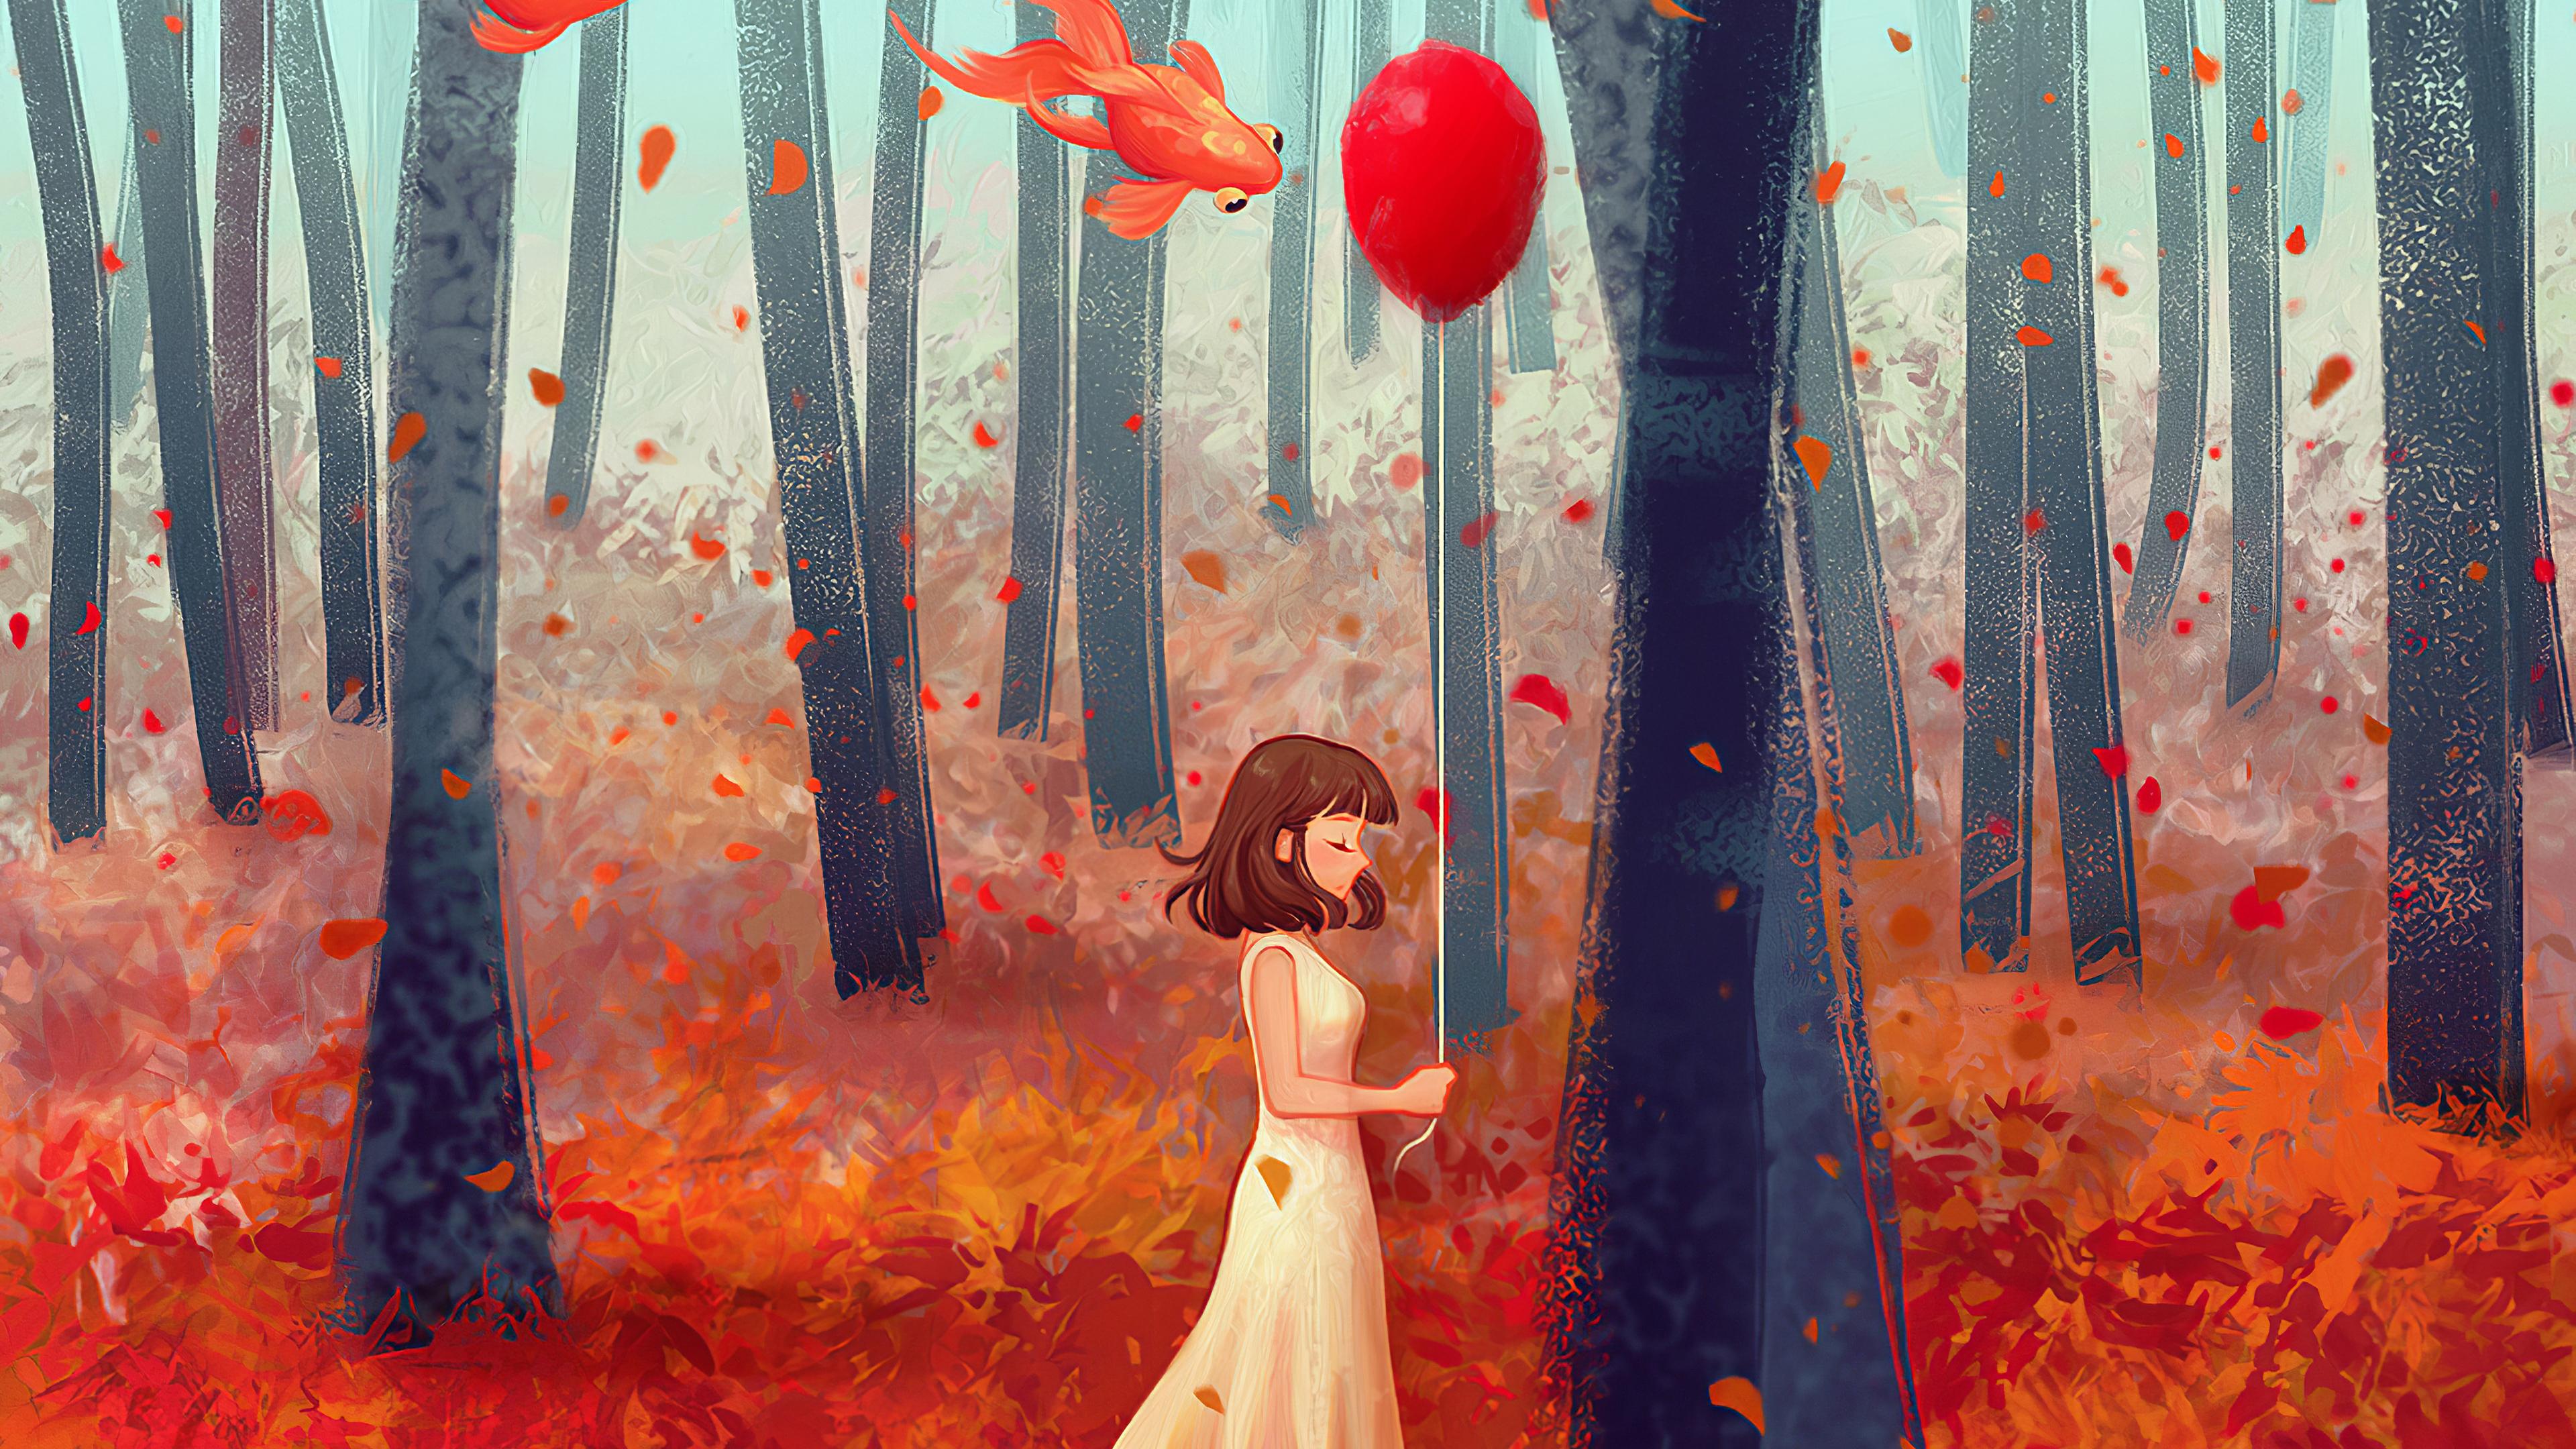 autumn dream girl 1574940867 - Autumn Dream Girl -